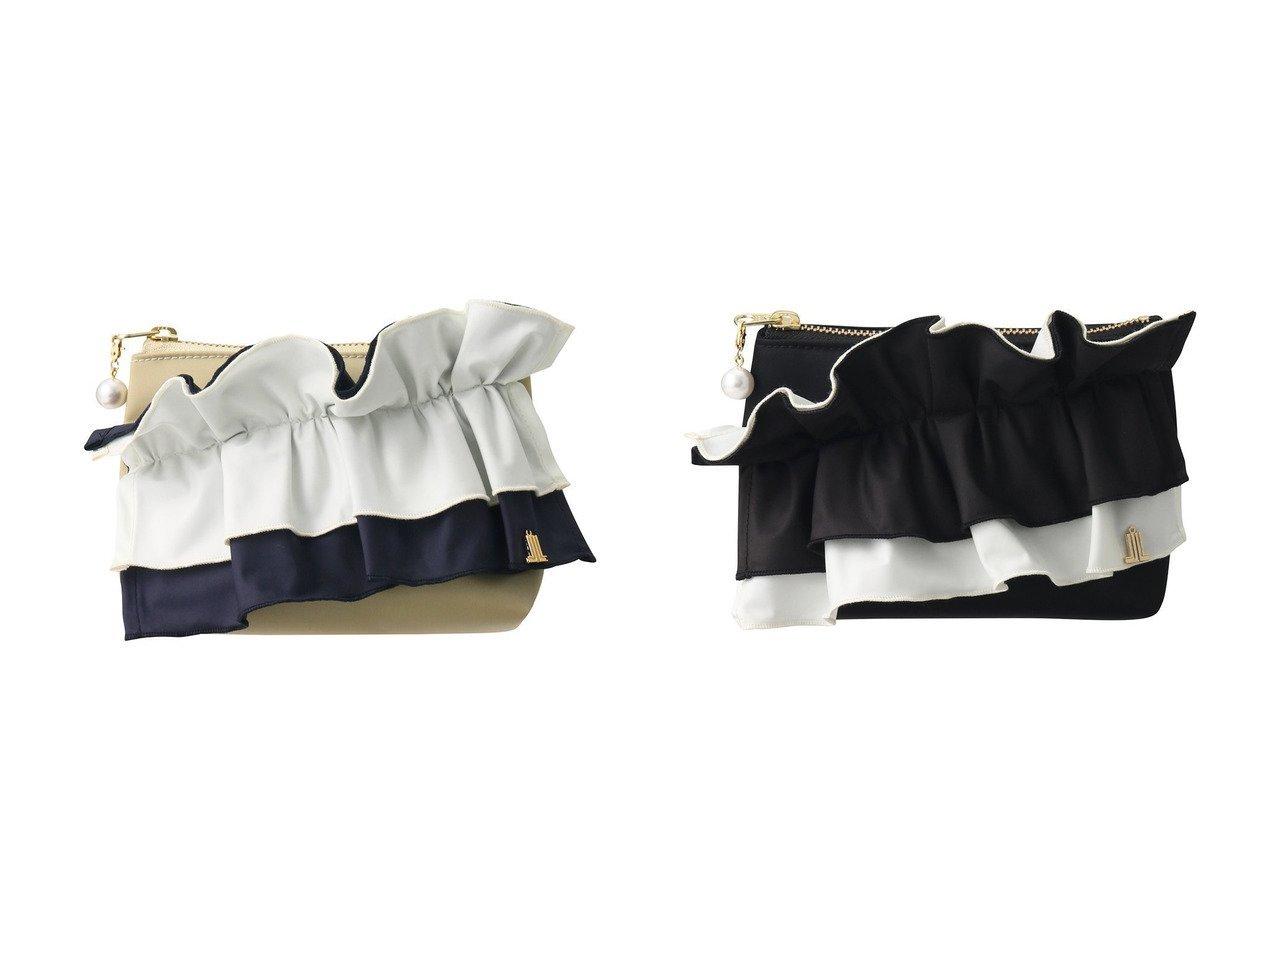 【LANVIN en Bleu/ランバン オン ブルー】のフリルポーチ 【バッグ・鞄】おすすめ!人気、トレンド・レディースファッションの通販 おすすめで人気の流行・トレンド、ファッションの通販商品 メンズファッション・キッズファッション・インテリア・家具・レディースファッション・服の通販 founy(ファニー) https://founy.com/ ファッション Fashion レディースファッション WOMEN ポーチ Pouches パール フリル ポーチ |ID:crp329100000039543